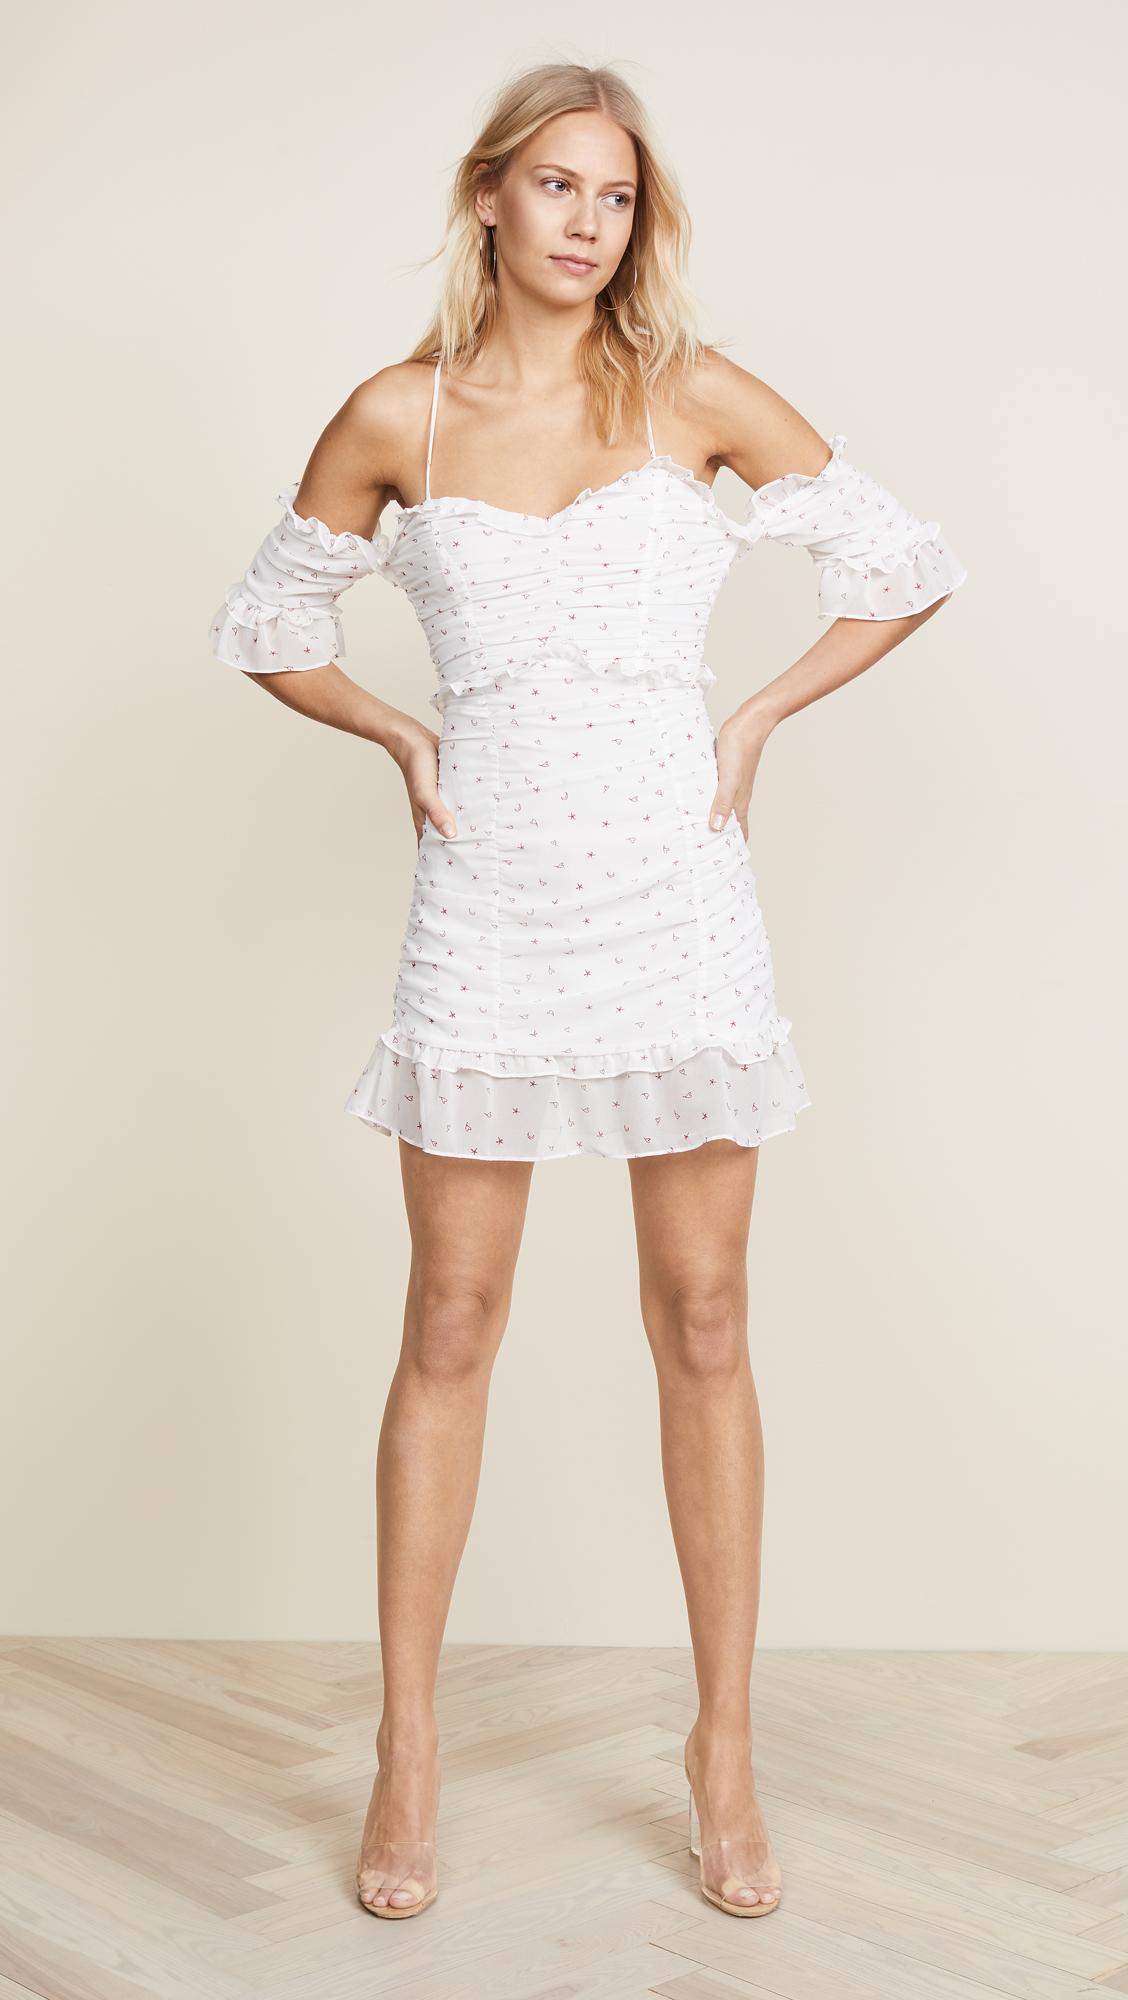 0403d8259c3 Shopbop Cocktail Dresses - Gomes Weine AG